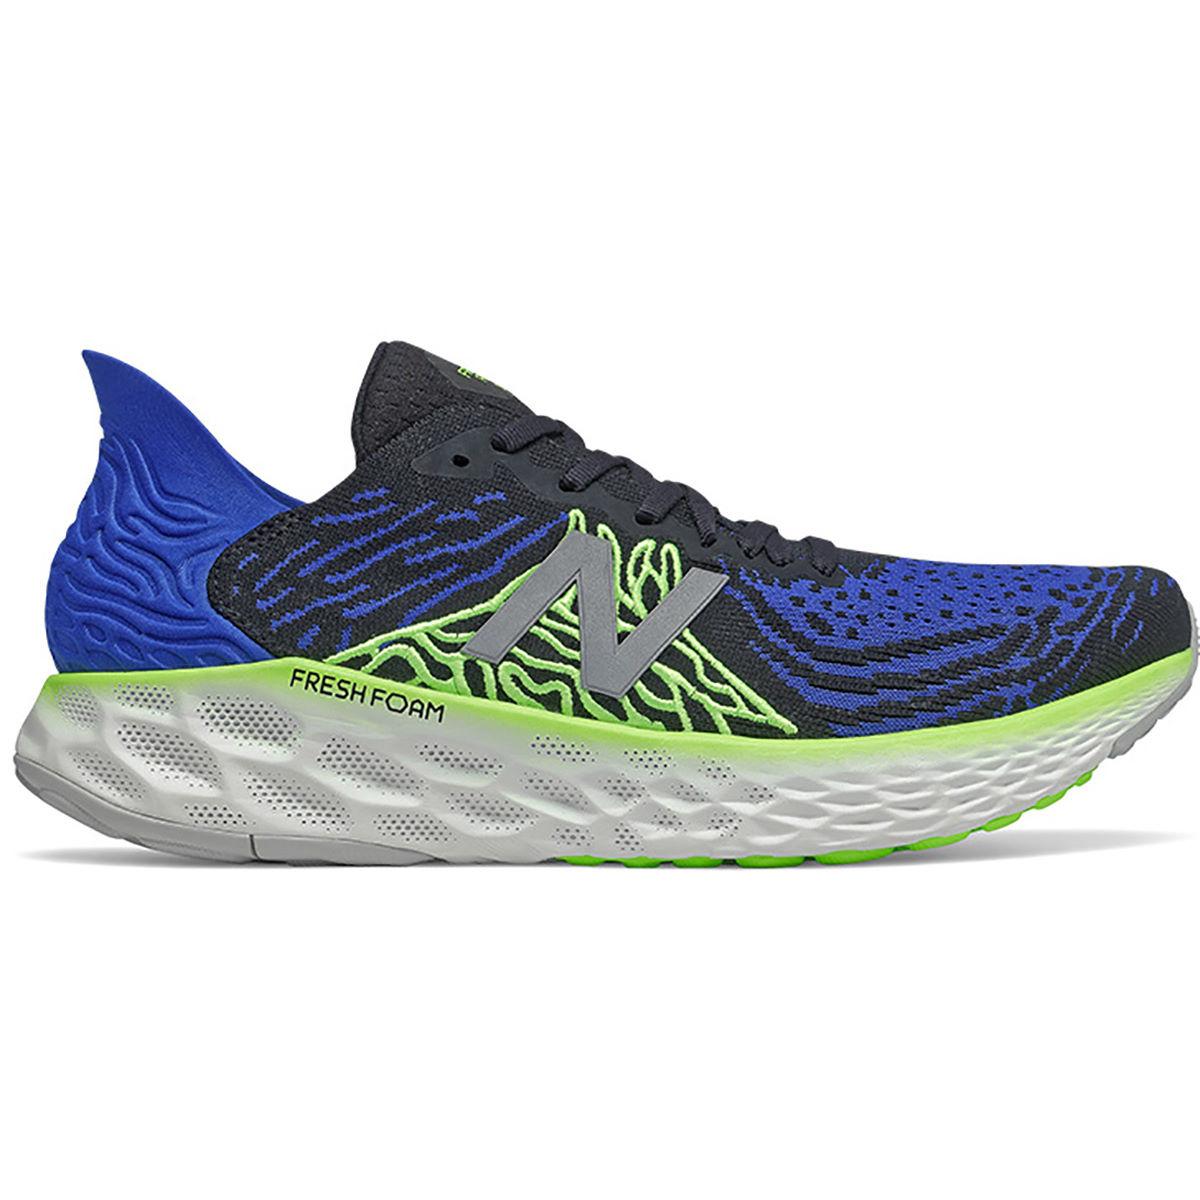 New Balance Men's Running Shoes 1080v10 Wide Blue - £74.25 @ Wiggle